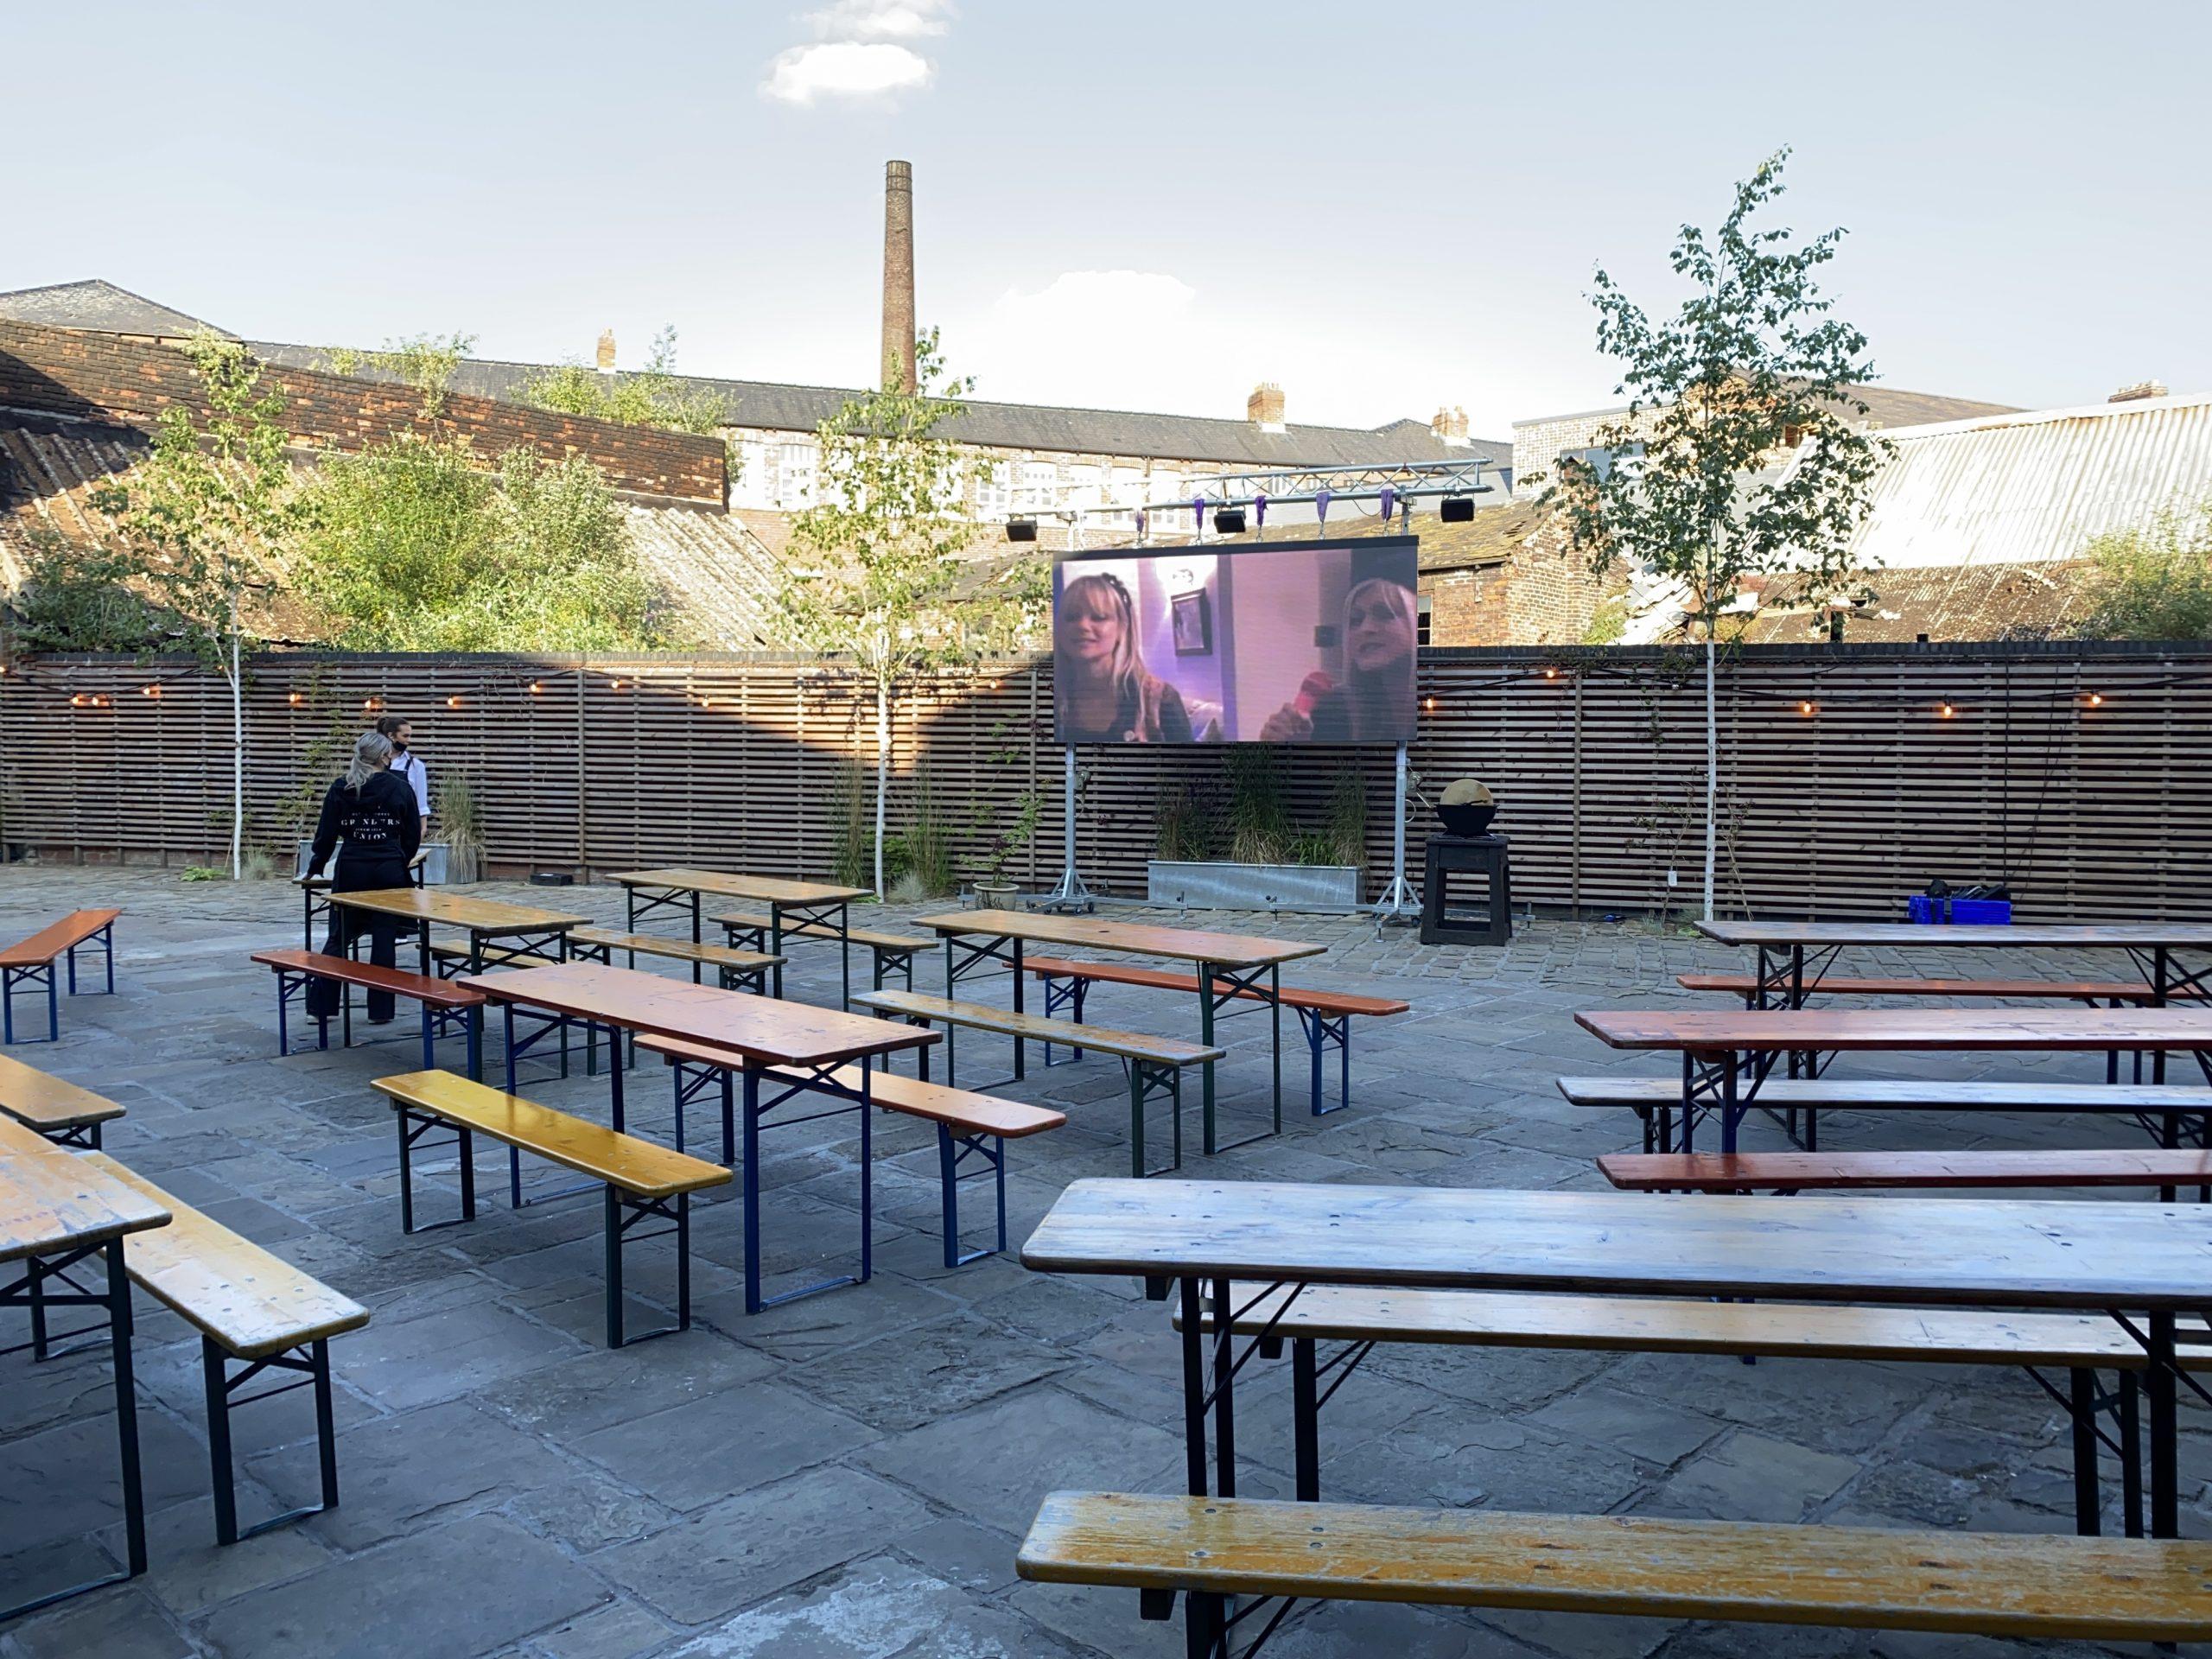 LED Screen in venue courtyard